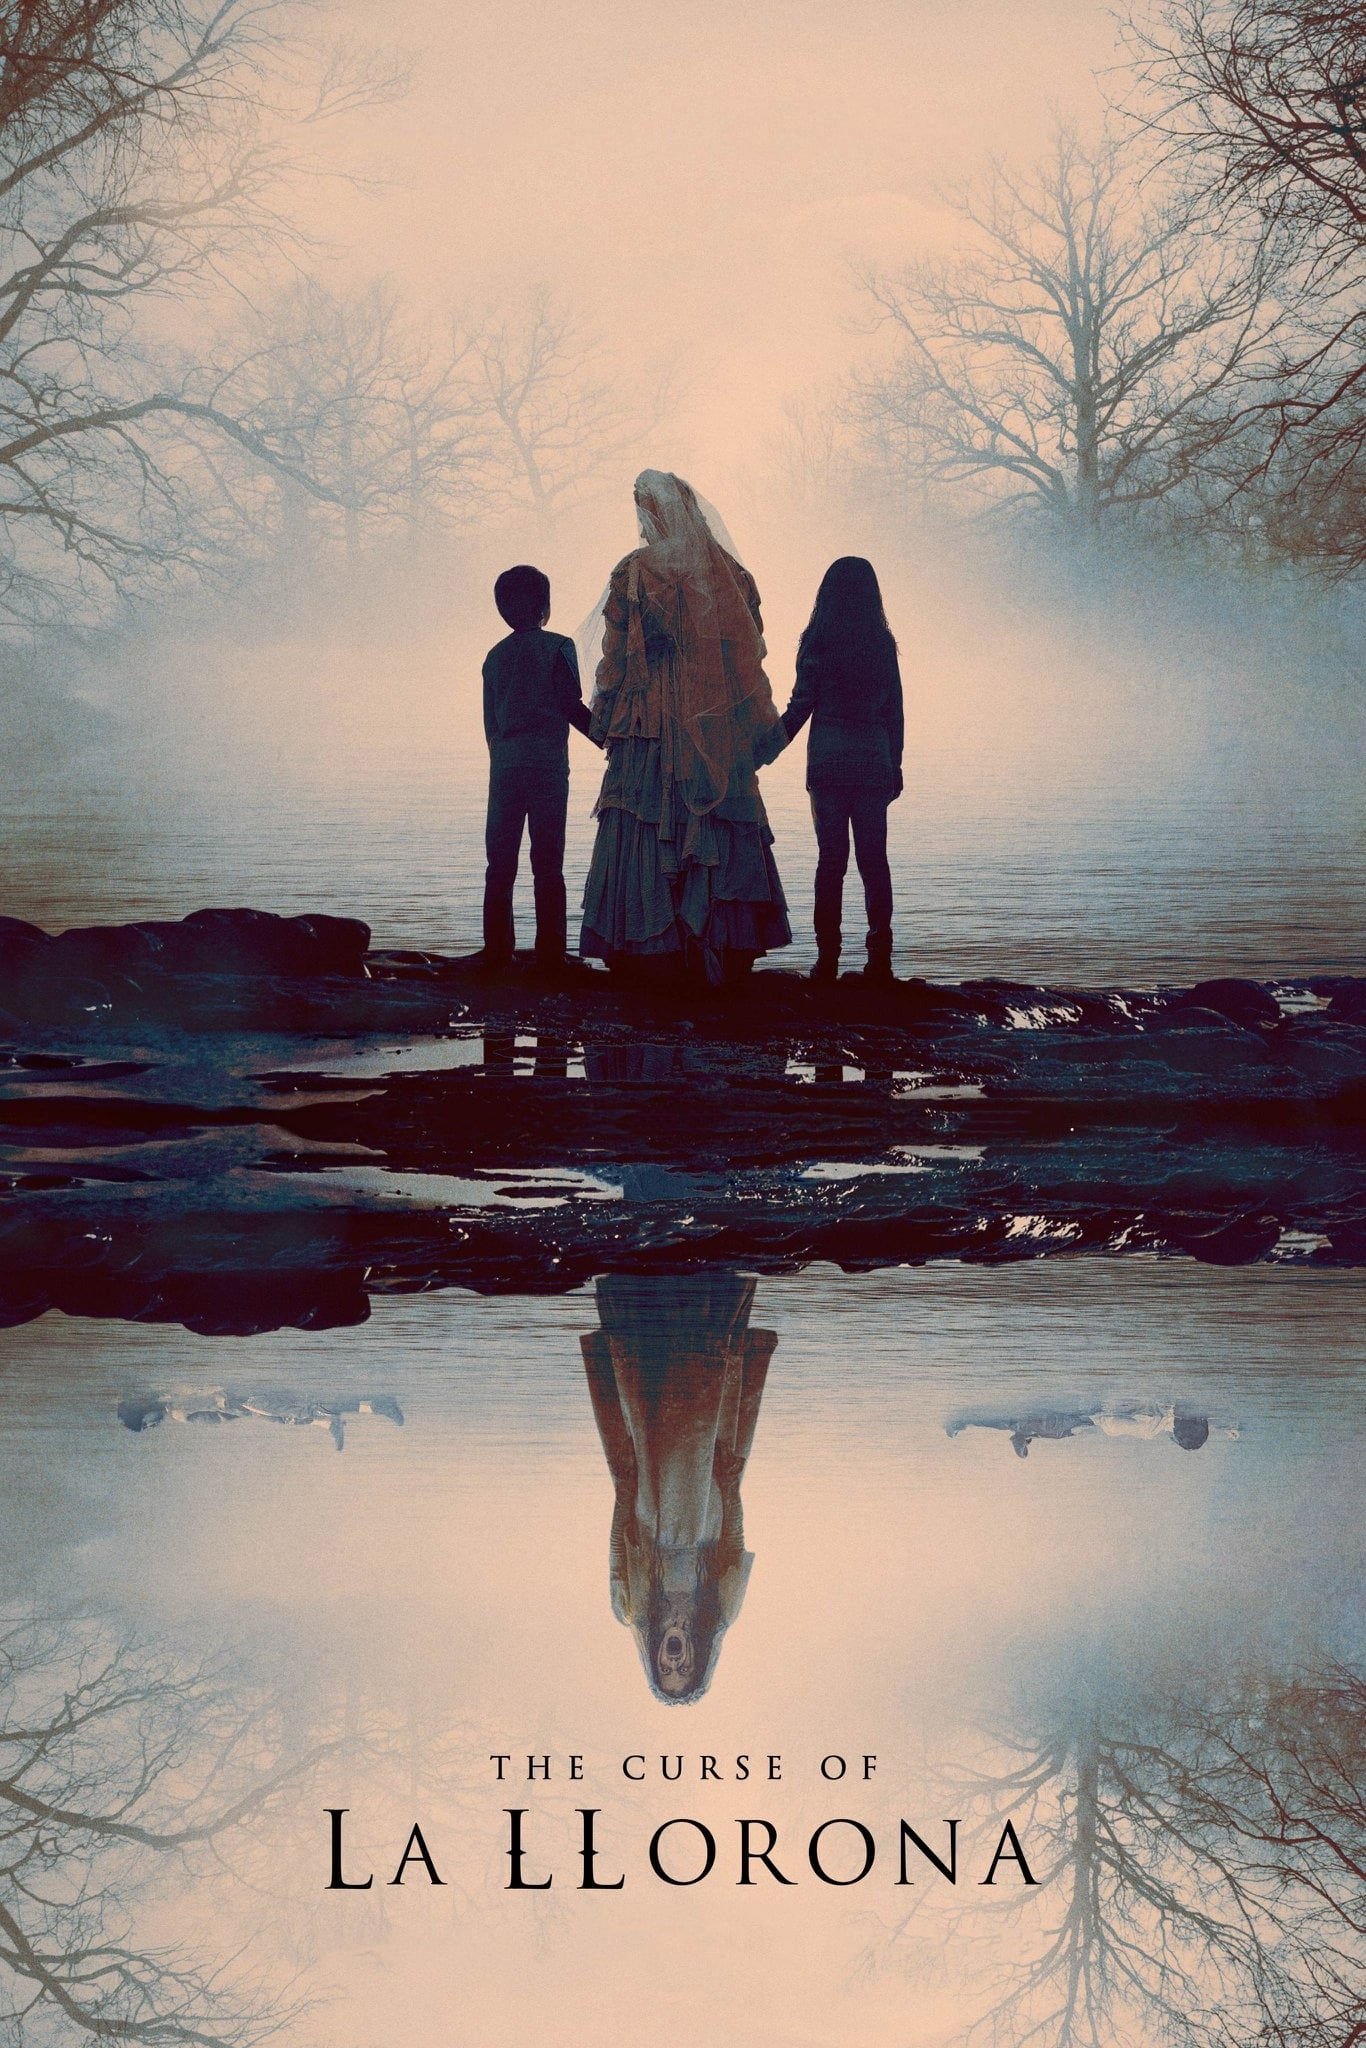 The Curse of La Llorona 2019 hollywood horror mystery thriller